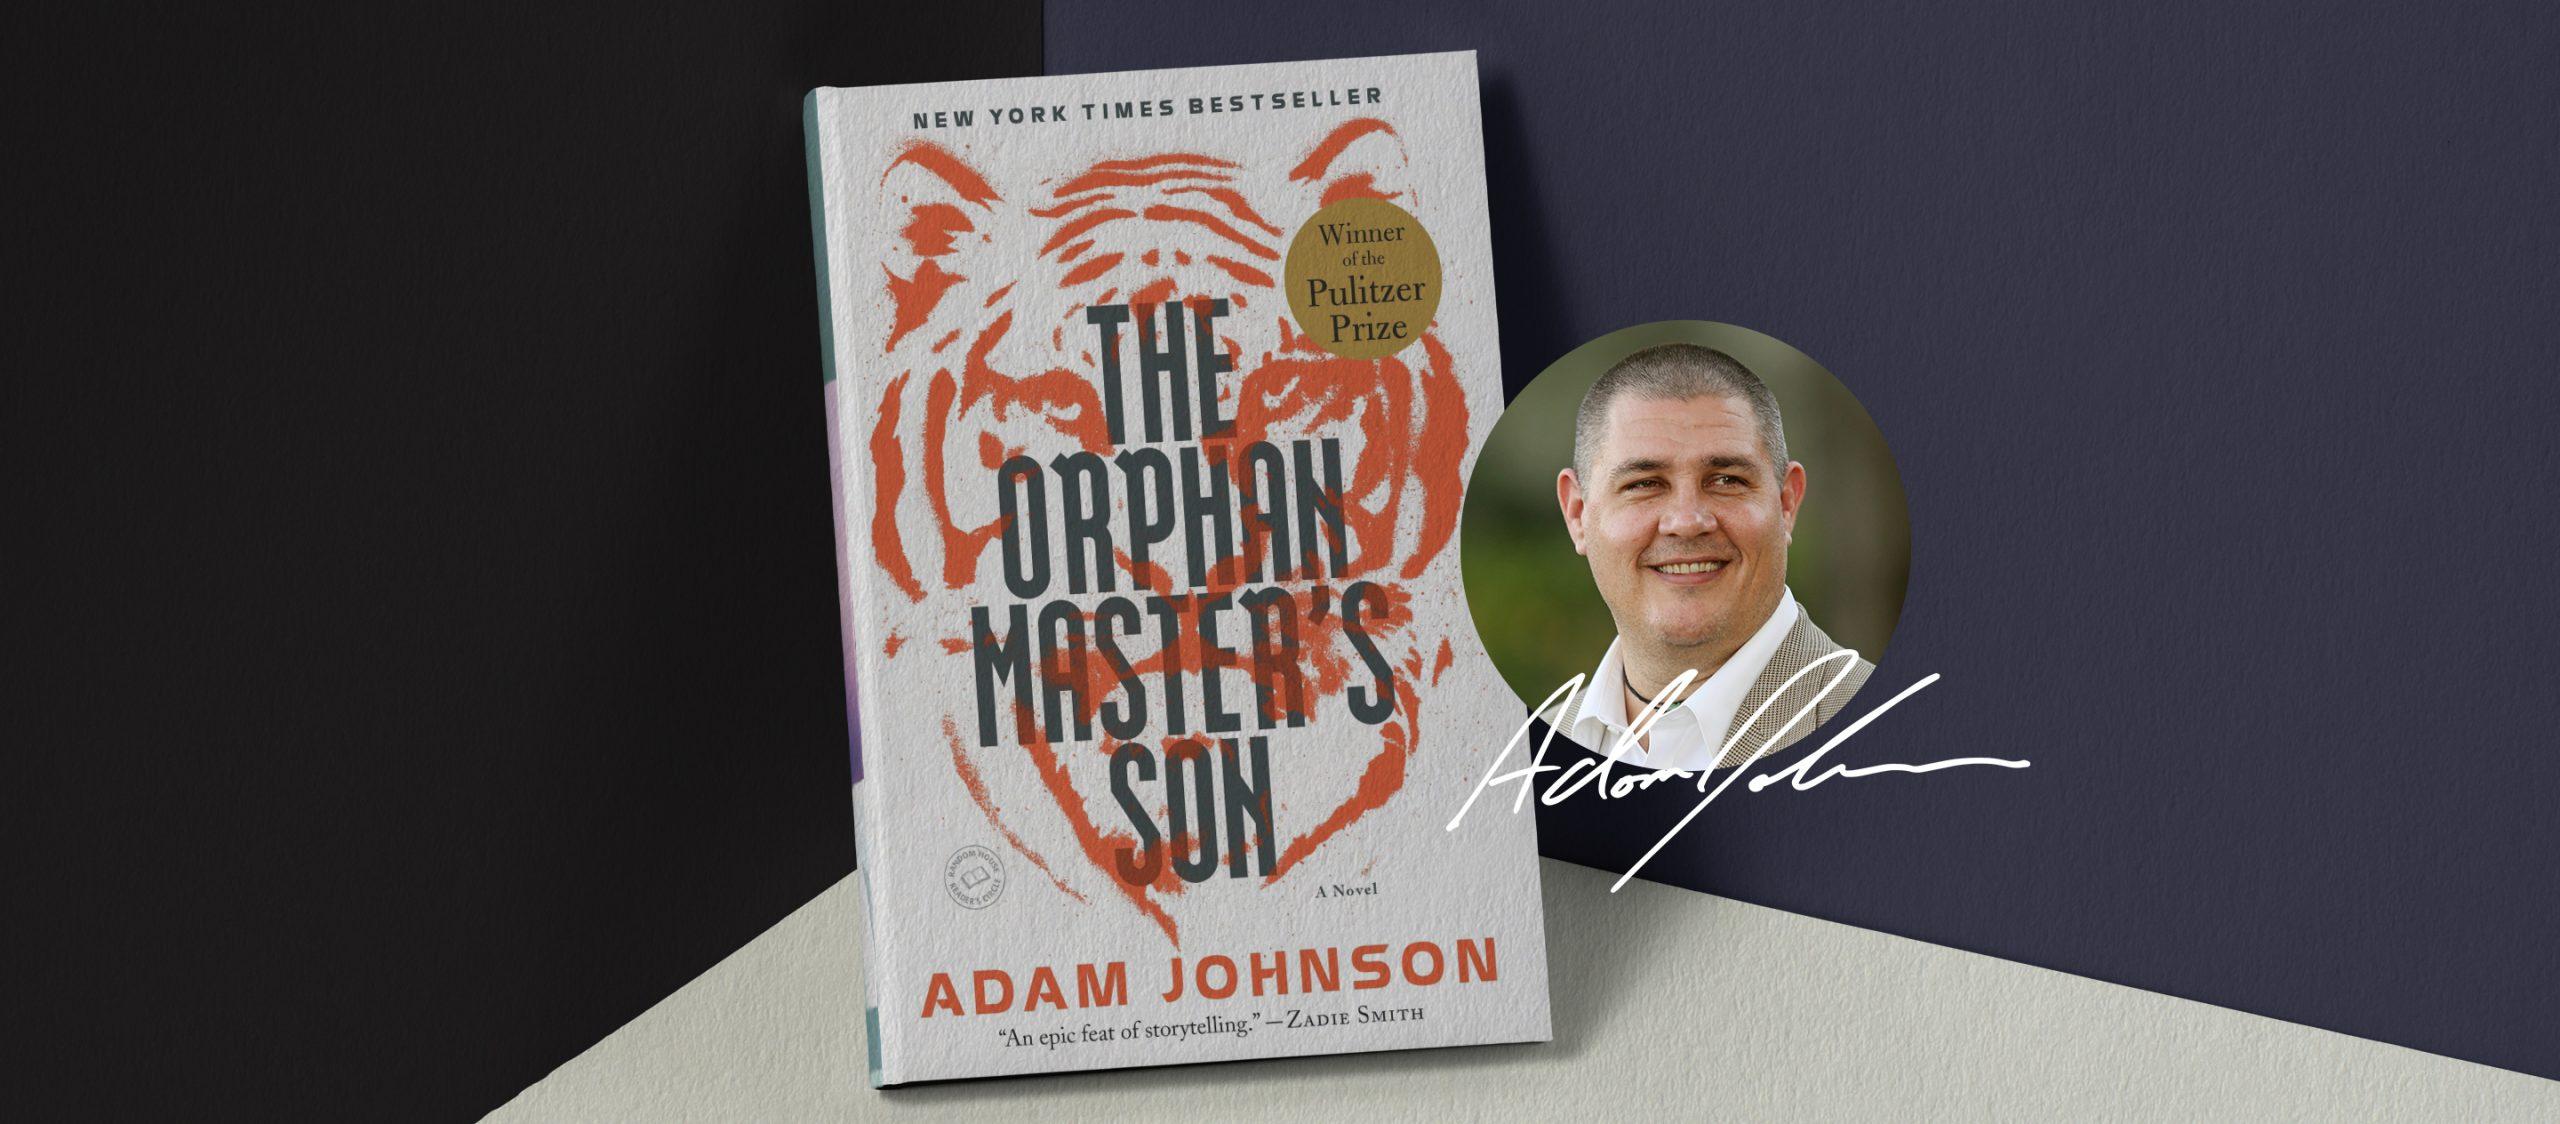 Adam Johnson นักเขียนชาวอเมริกันผู้คว้ารางวัลพูลิตเซอร์จากนวนิยายว่าด้วยประเทศเกาหลีเหนือ